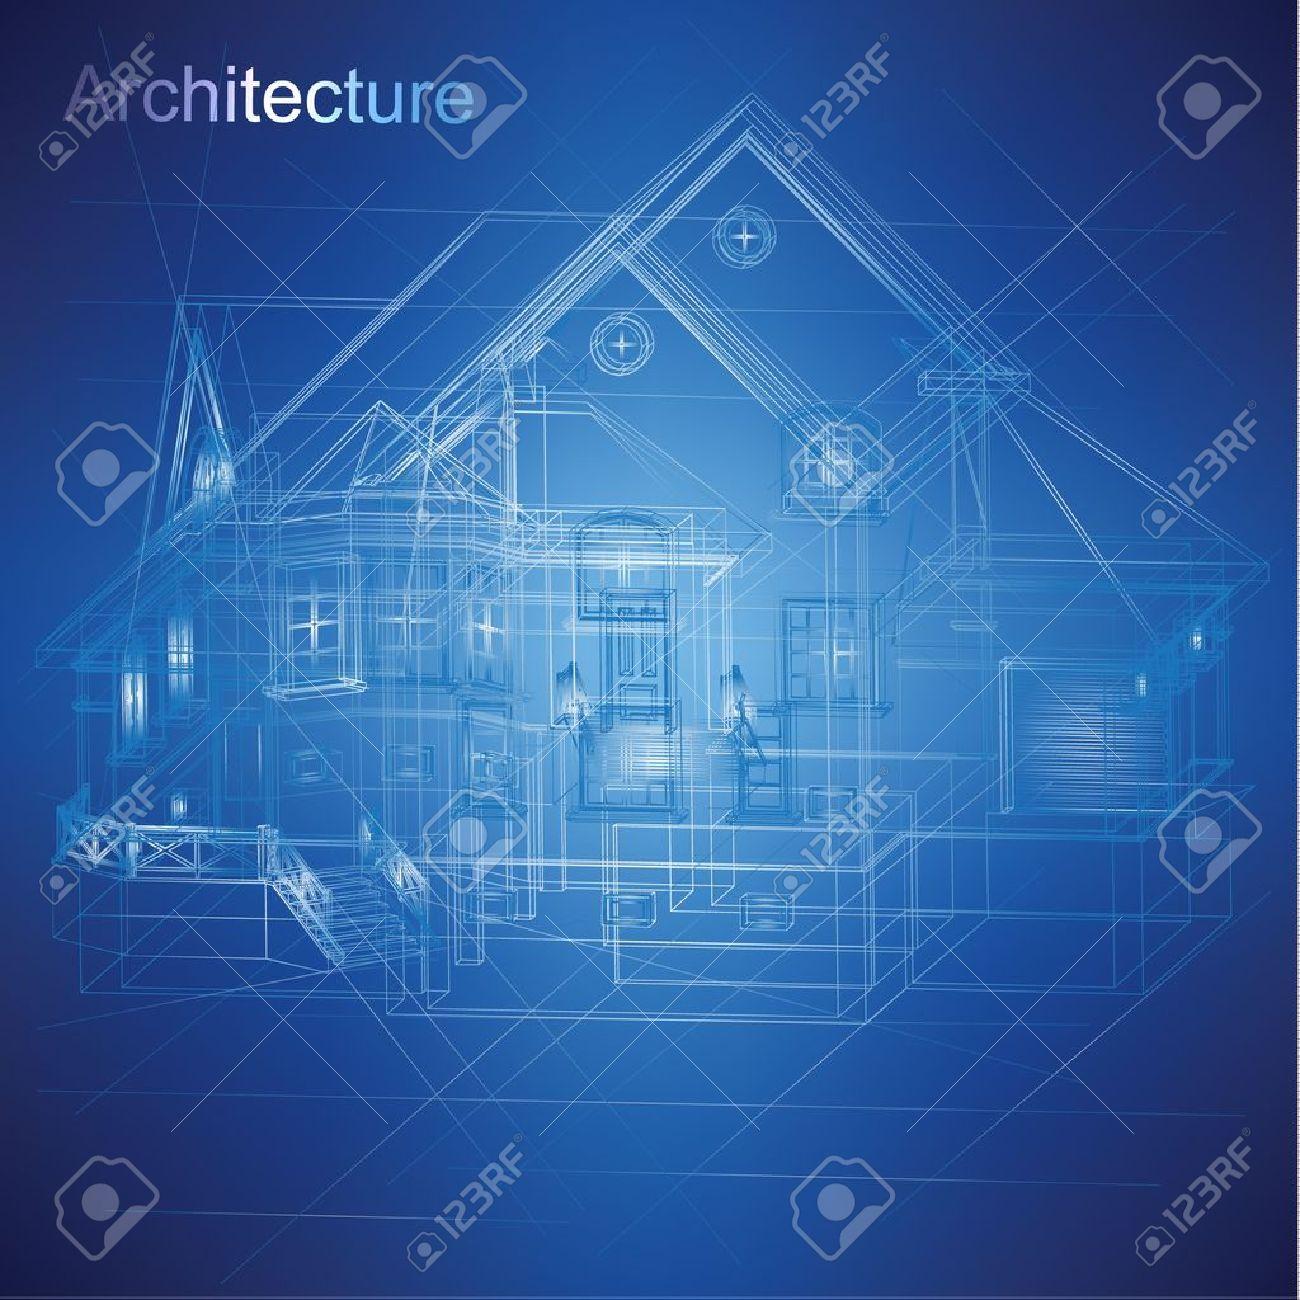 Urban Blueprint  vector -  Architectural background Stock Vector - 19145014